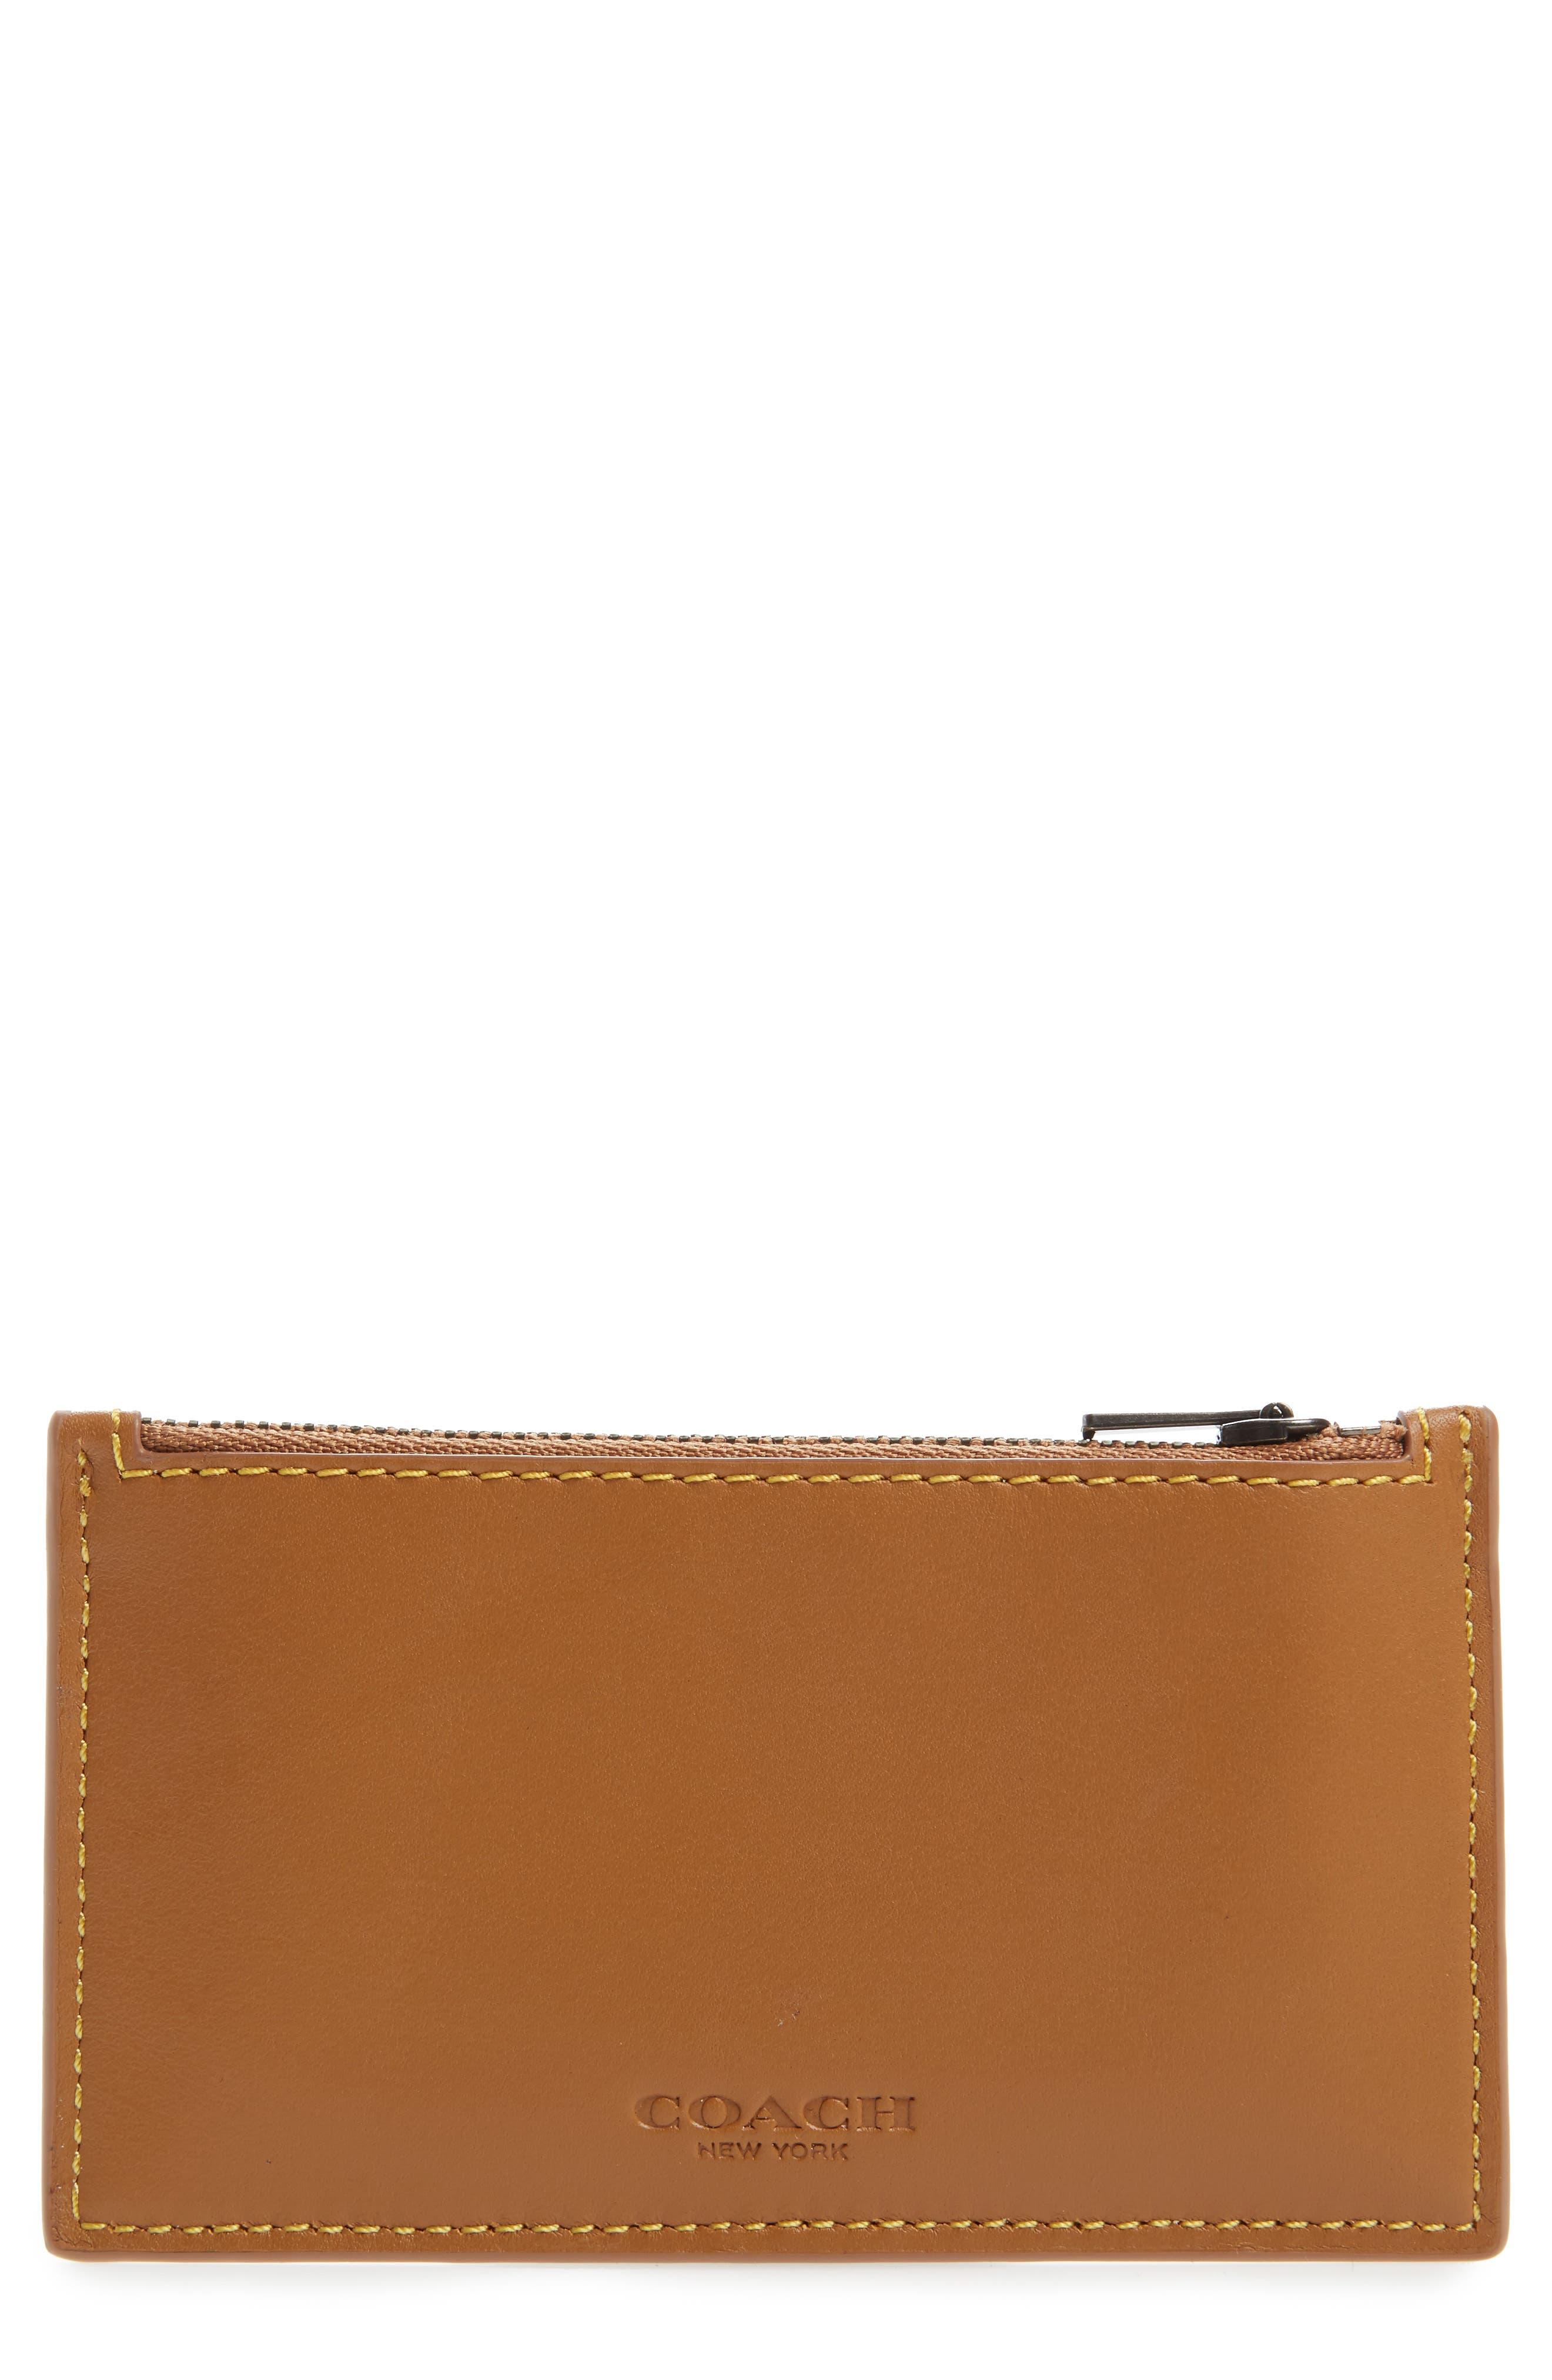 COACH 1941 Zip Leather Card Case